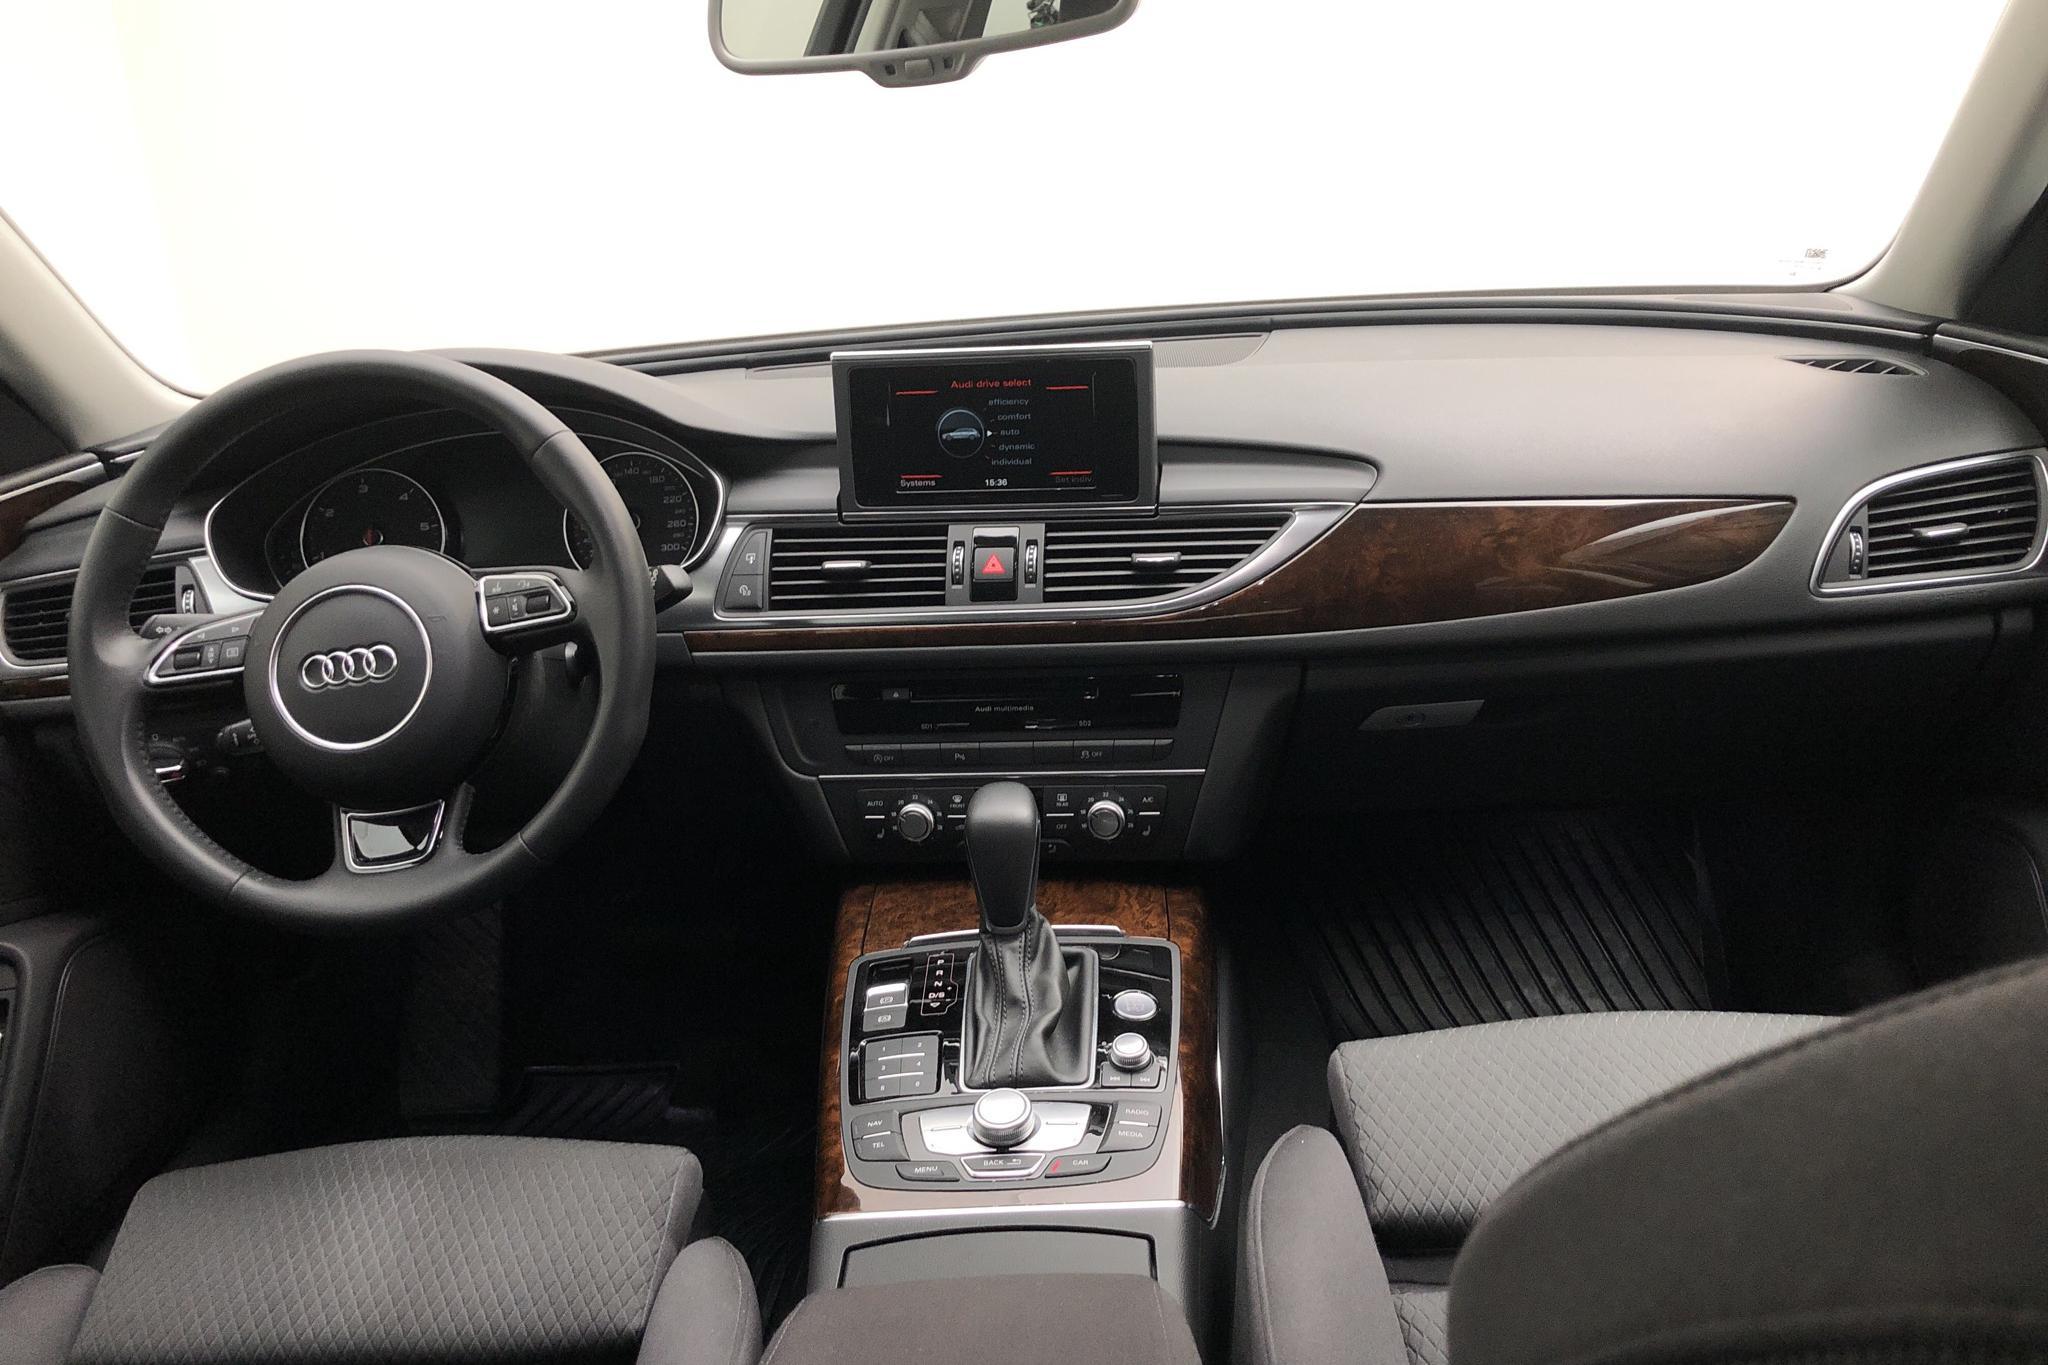 Audi A6 2.0 TDI Avant (190hk) - 90 200 km - Automatic - white - 2018